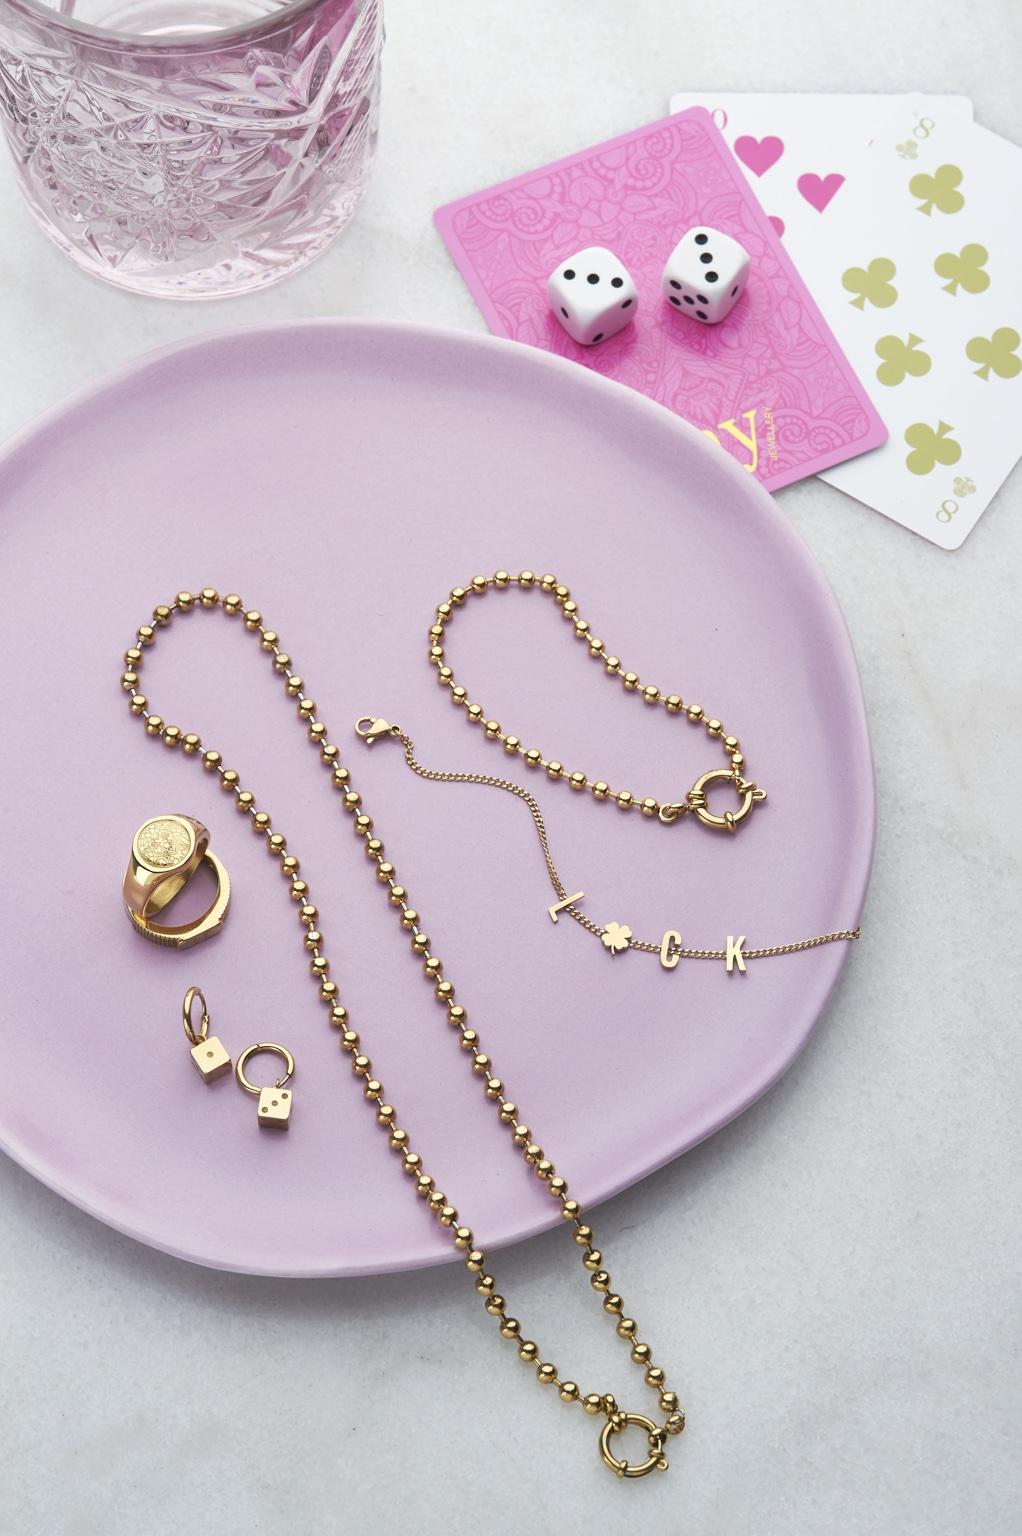 My Jewellery - my-11